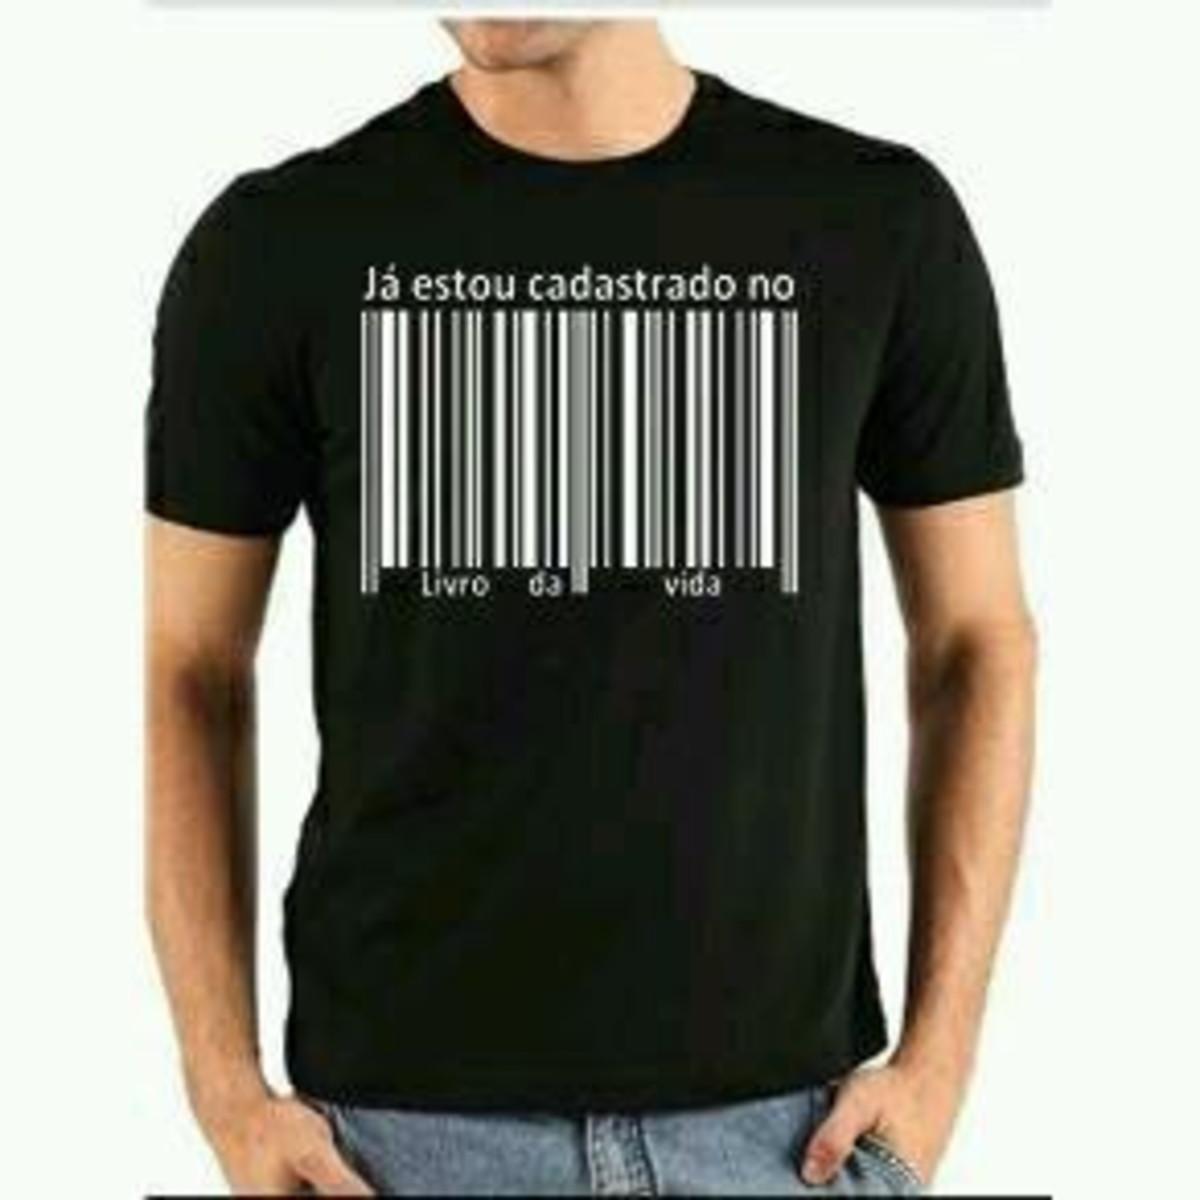 7ecfb9dbb7 Camiseta gospel no Elo7